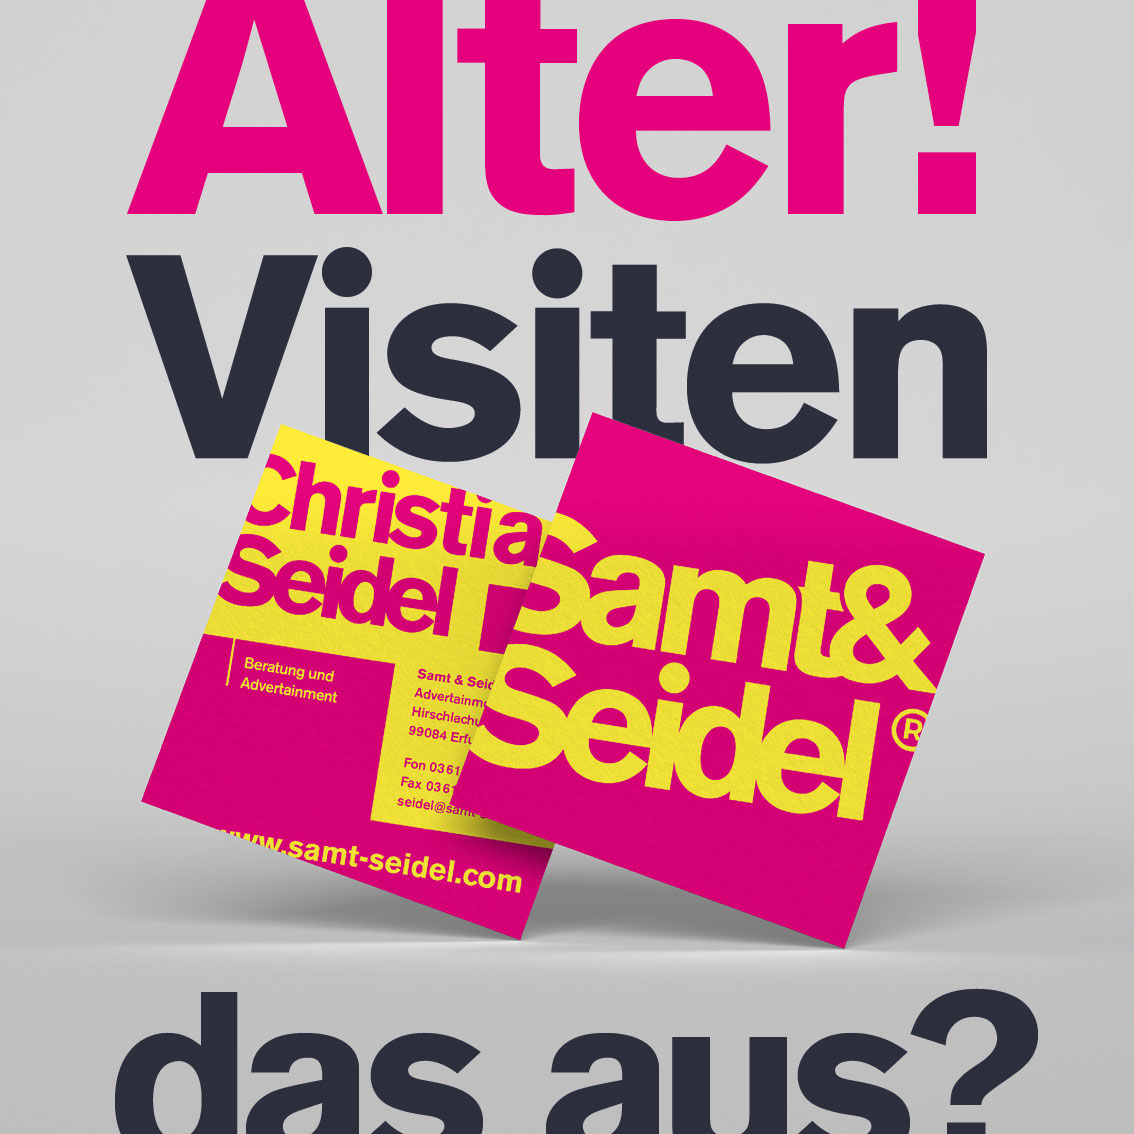 S&S_Referenzen_Advertainment_17